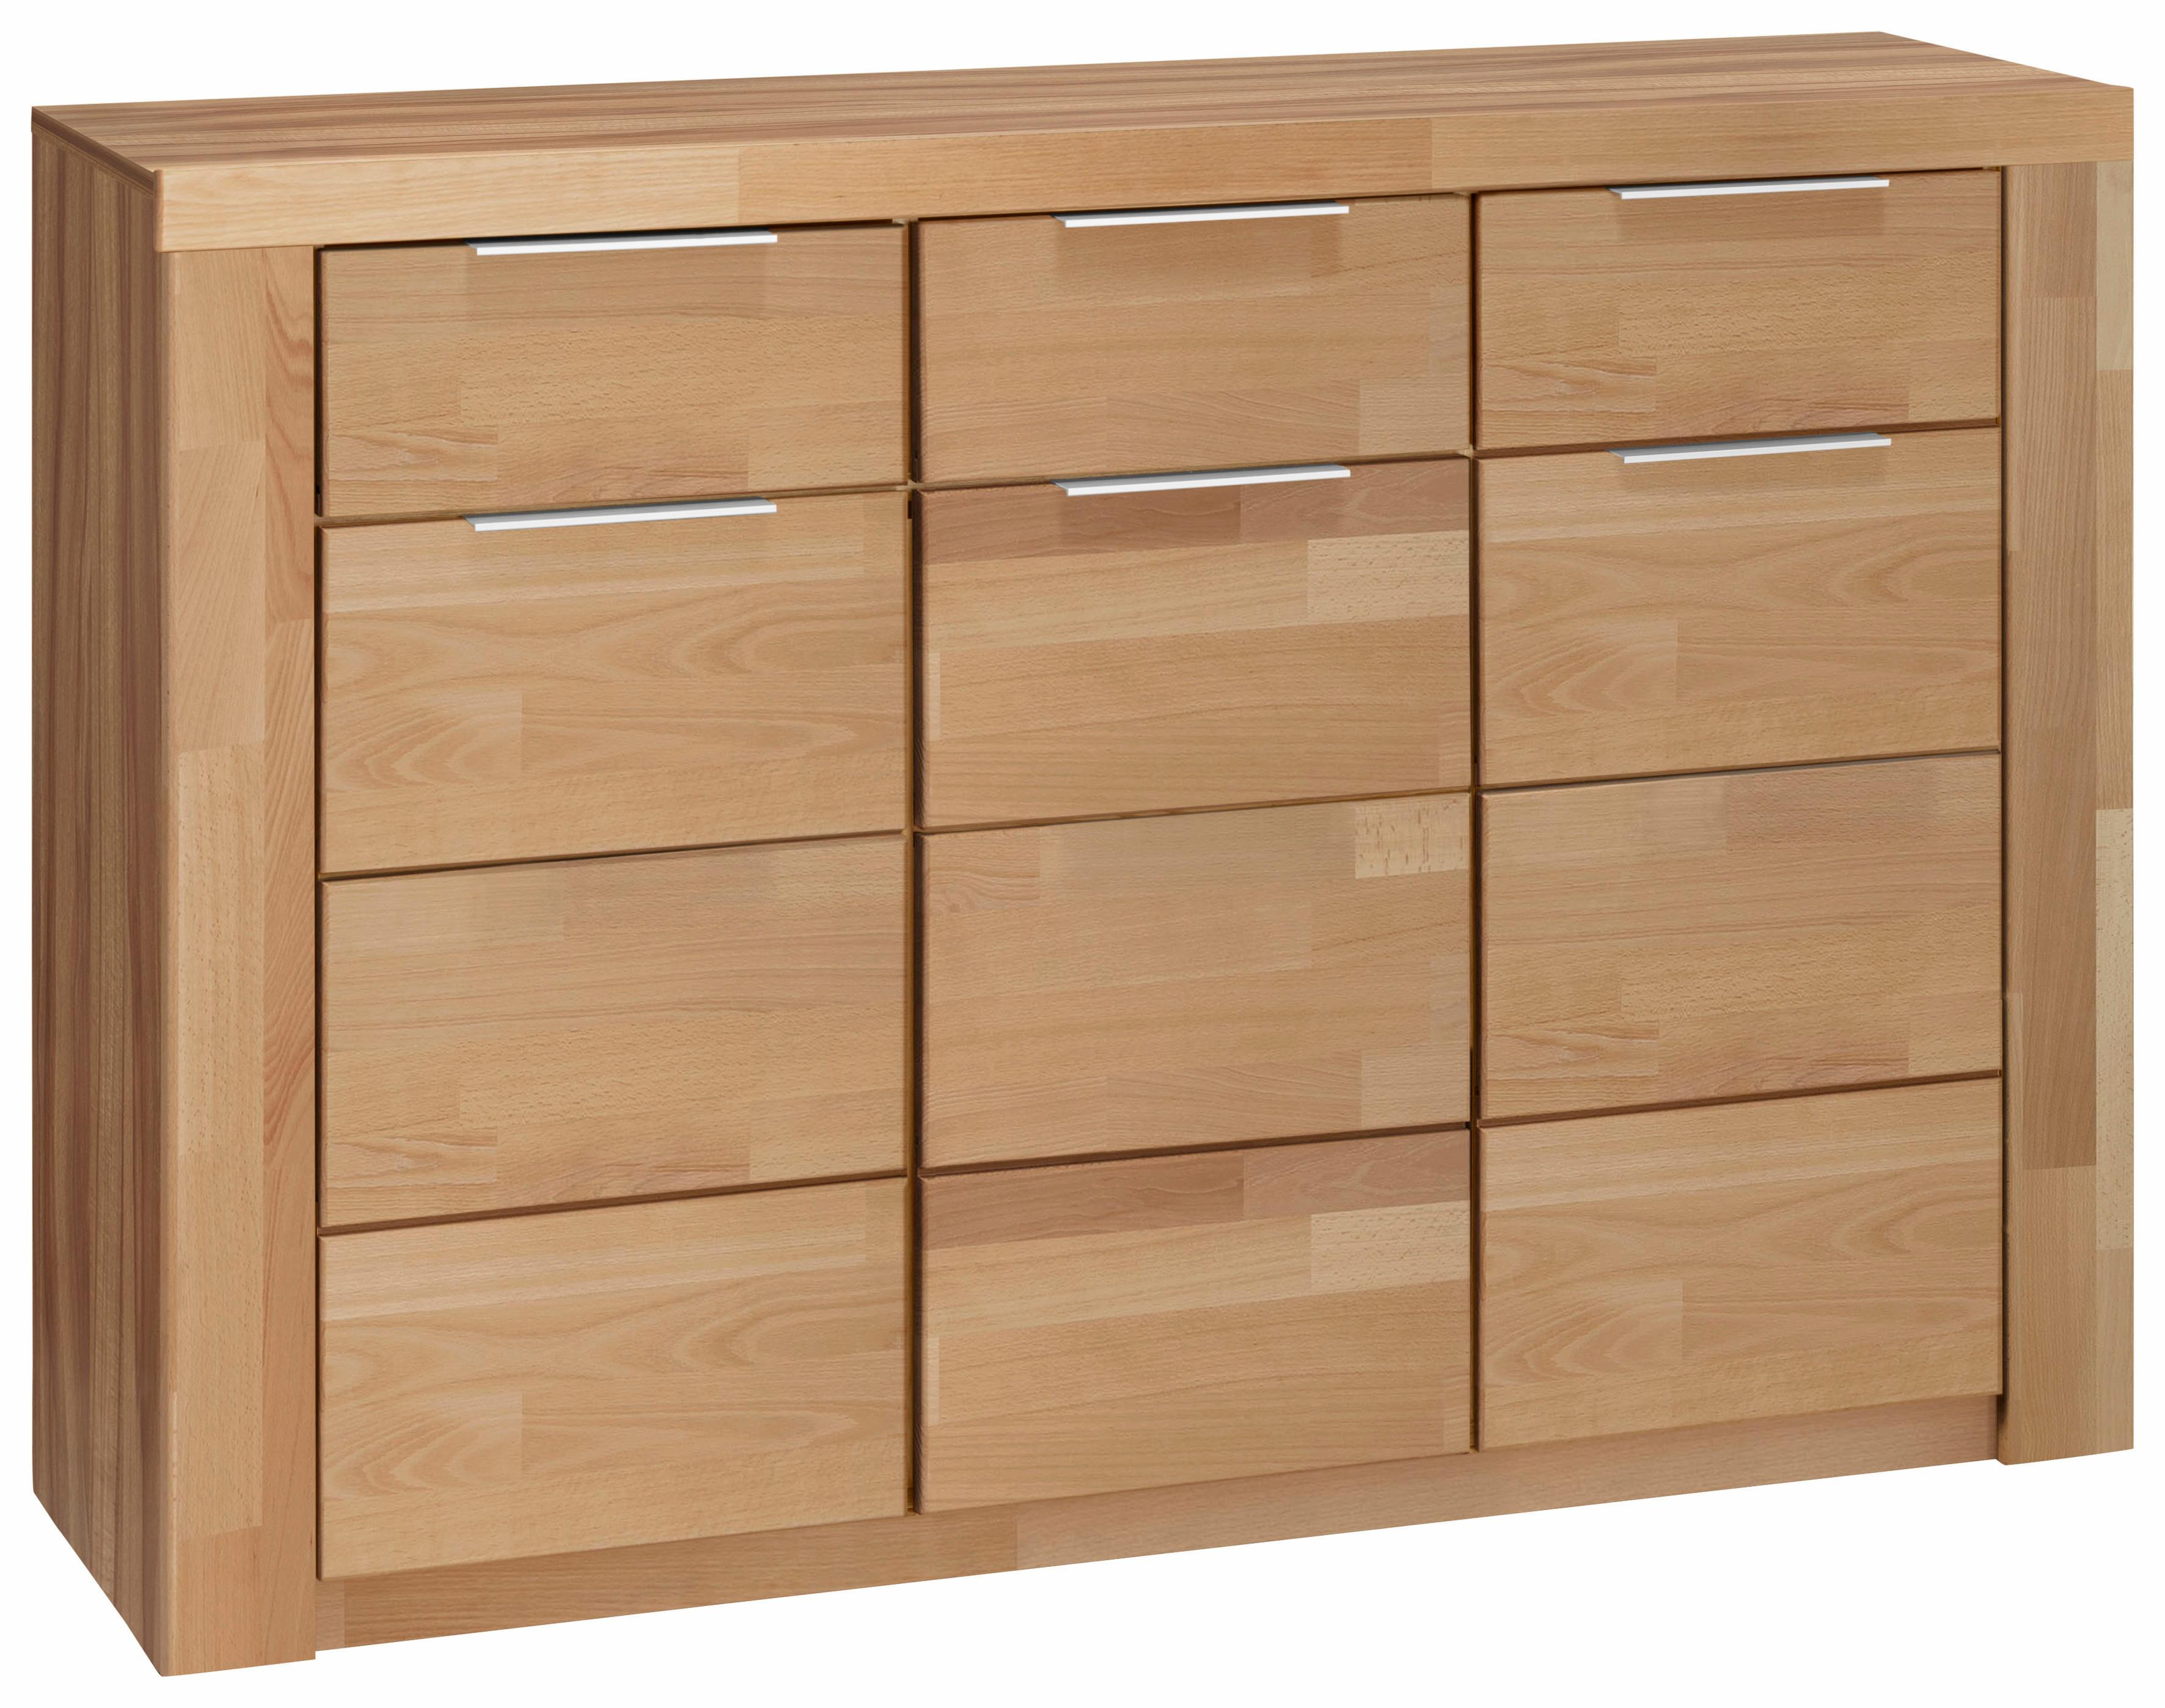 Sideboard Zara Breite 140 cm